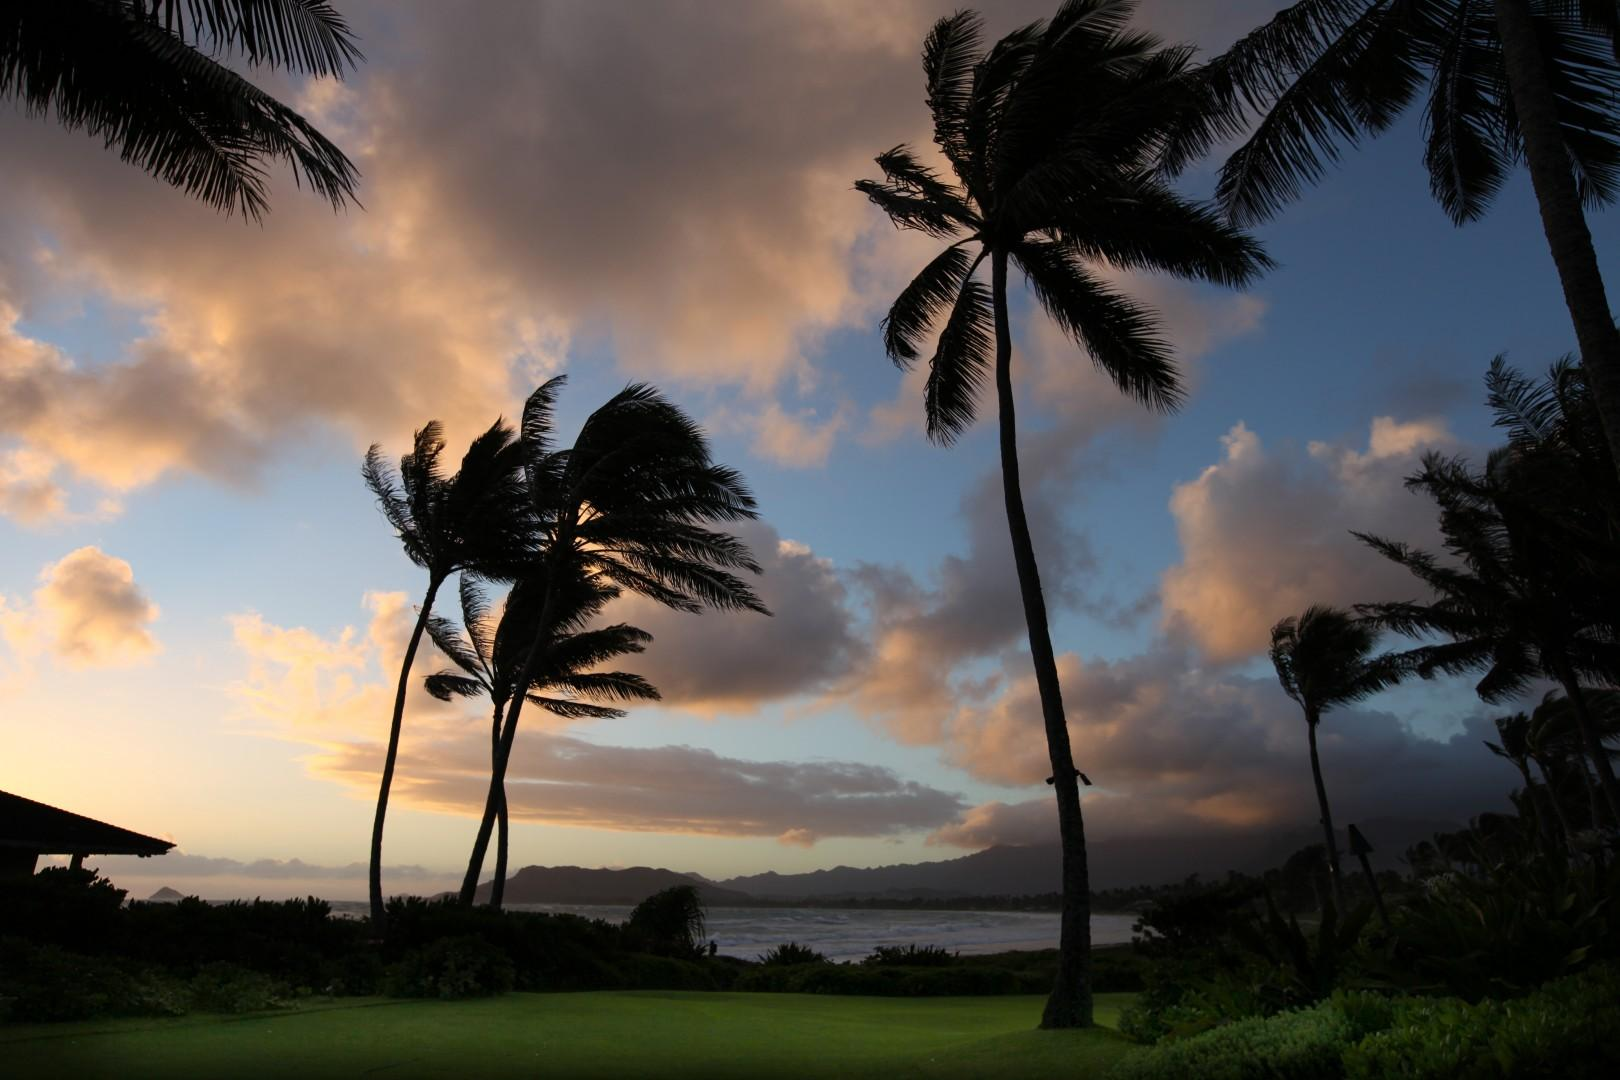 Trees swaying overlooking Kailua Beach